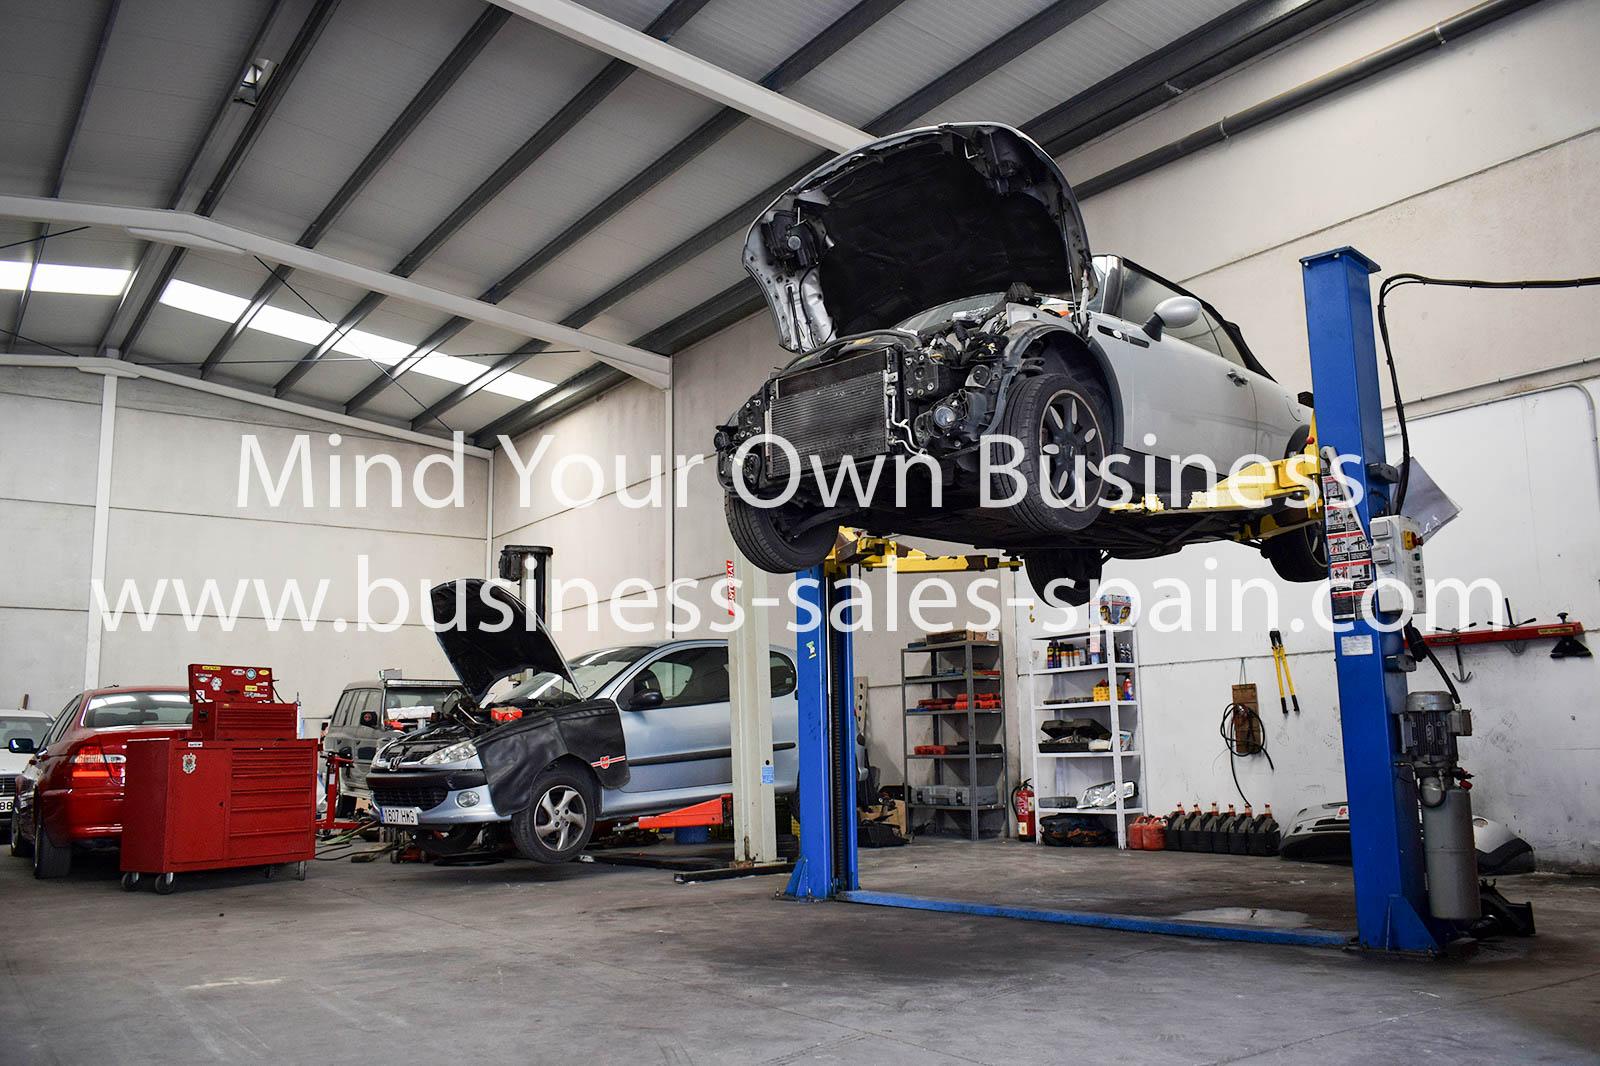 Very Well Established Mechanics Garage based in Manilva.